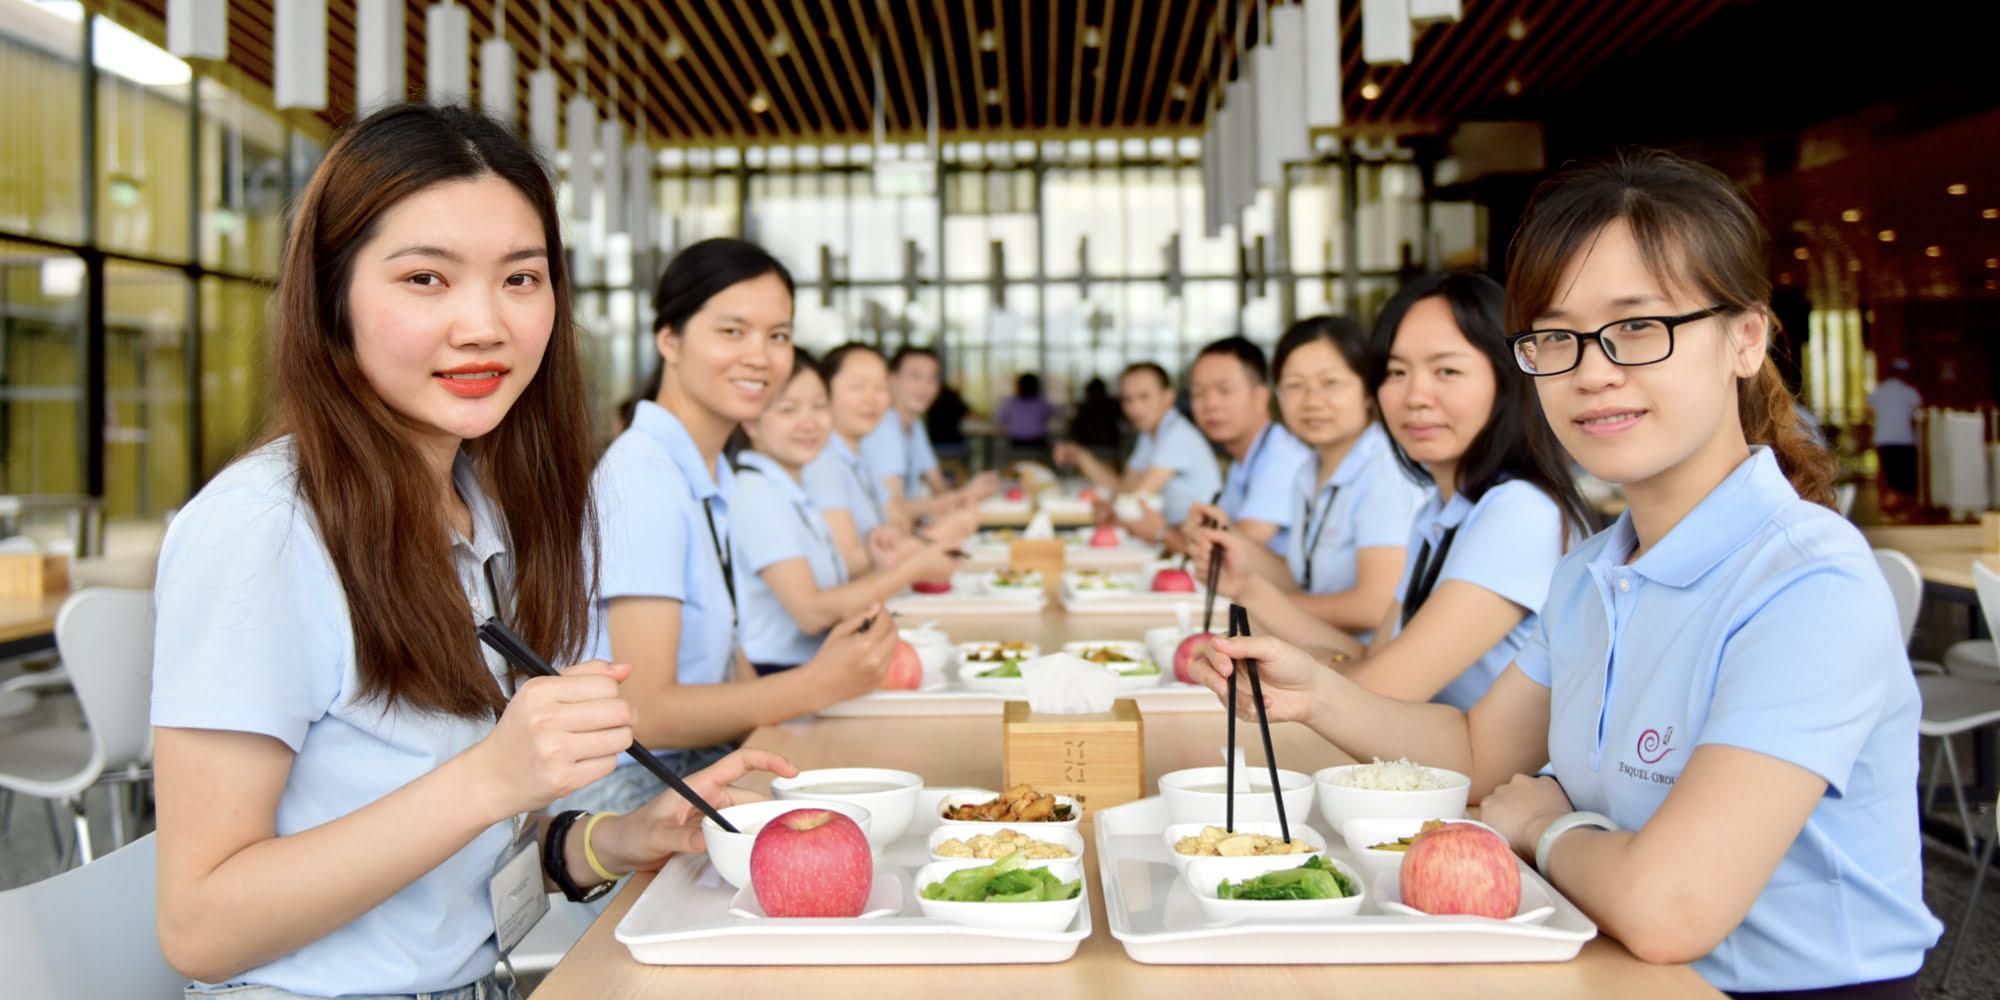 Dining service at Esquel Integral